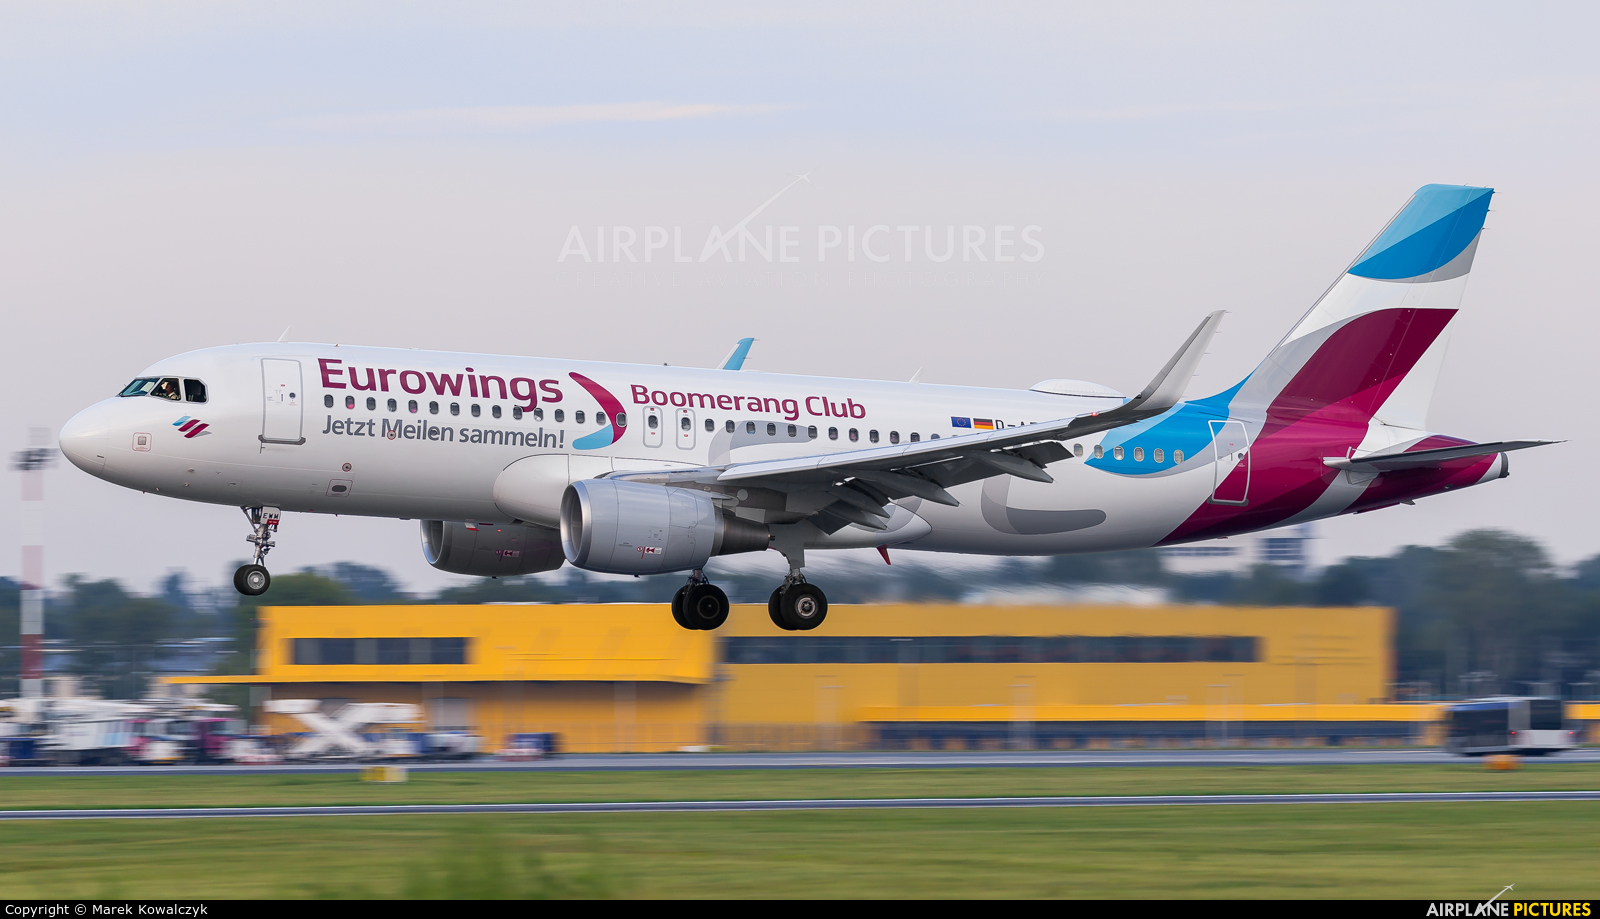 Eurowings D-AEWM aircraft at Warsaw - Frederic Chopin